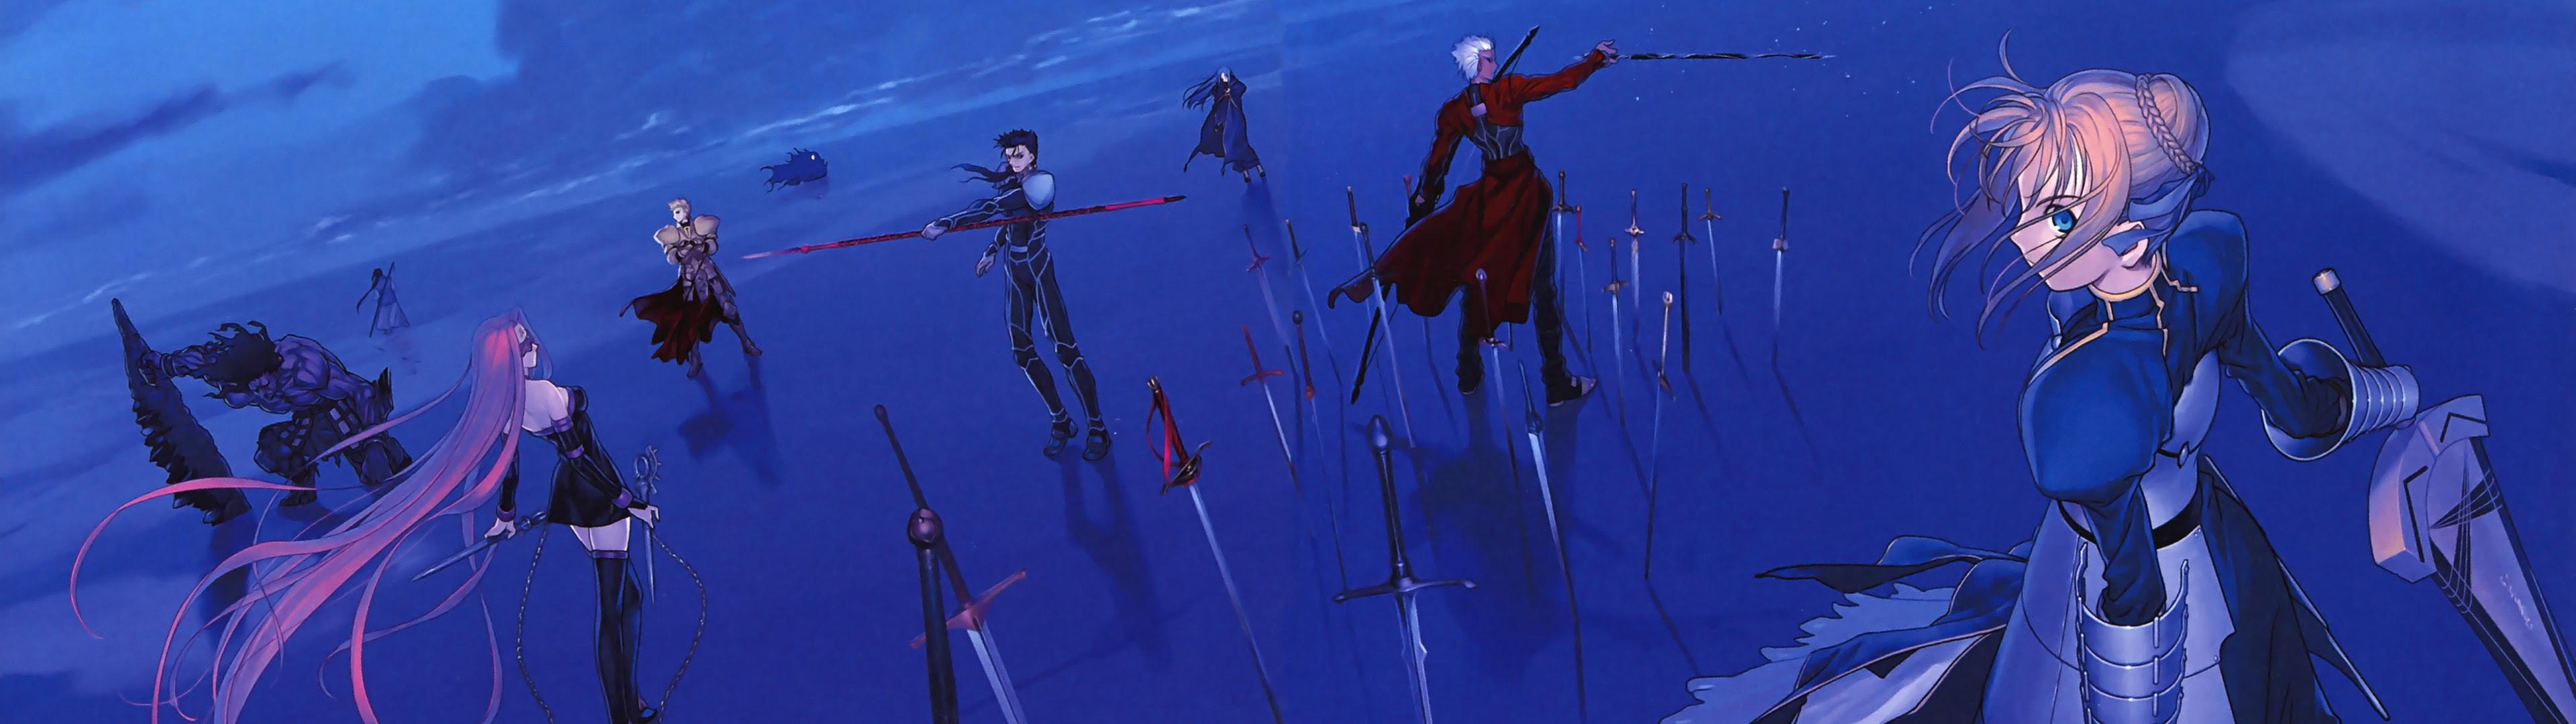 Dual Screen Wallpaper Anime 3840x1200 Wallpaper